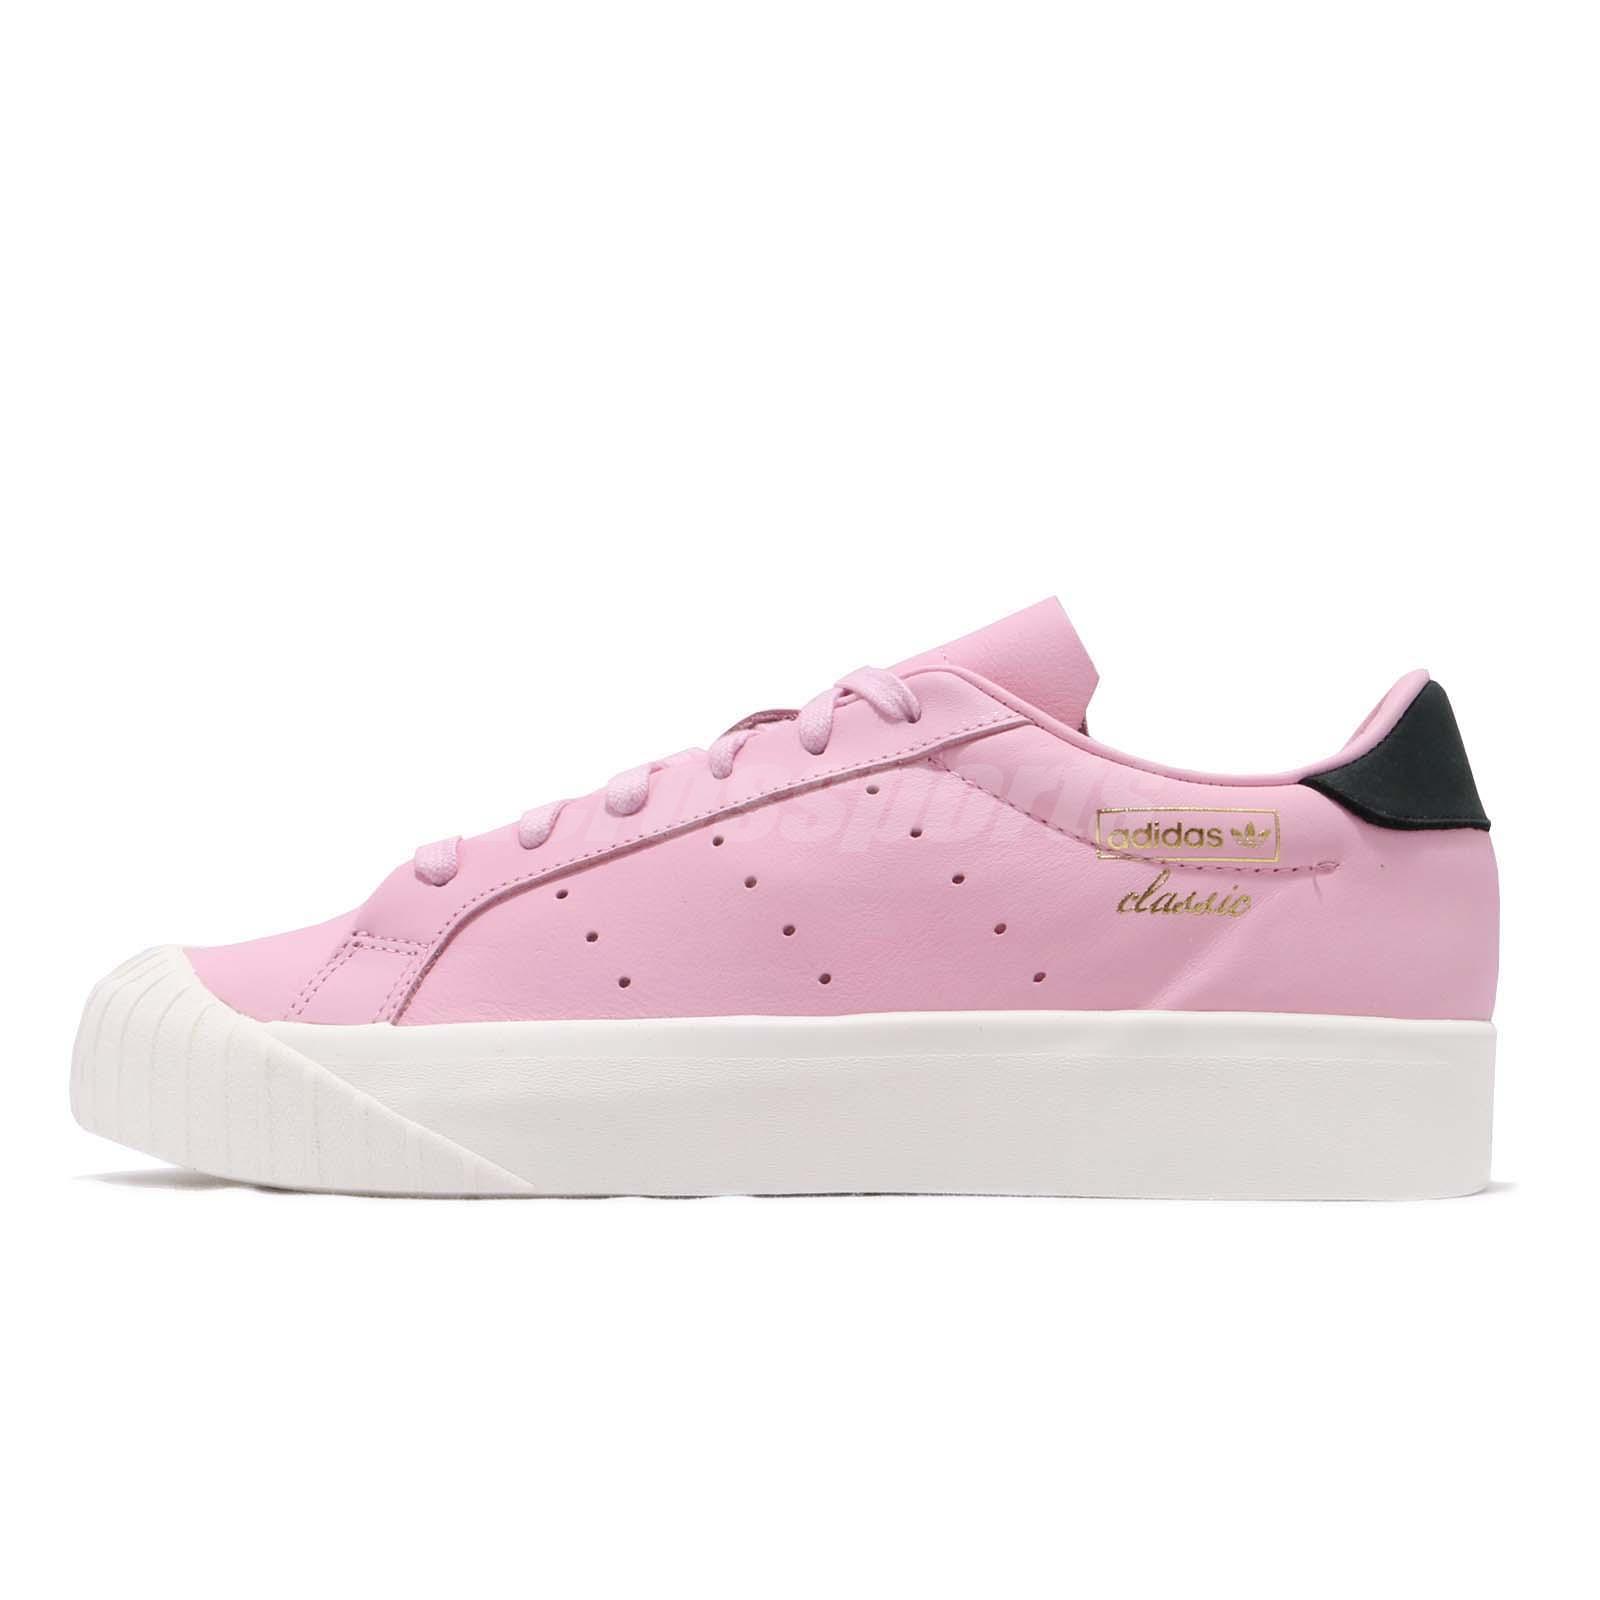 buy online 97198 3cf63 adidas Originals Everyn W Wonder Pink Black Women Classic Casual Shoes  CQ2044